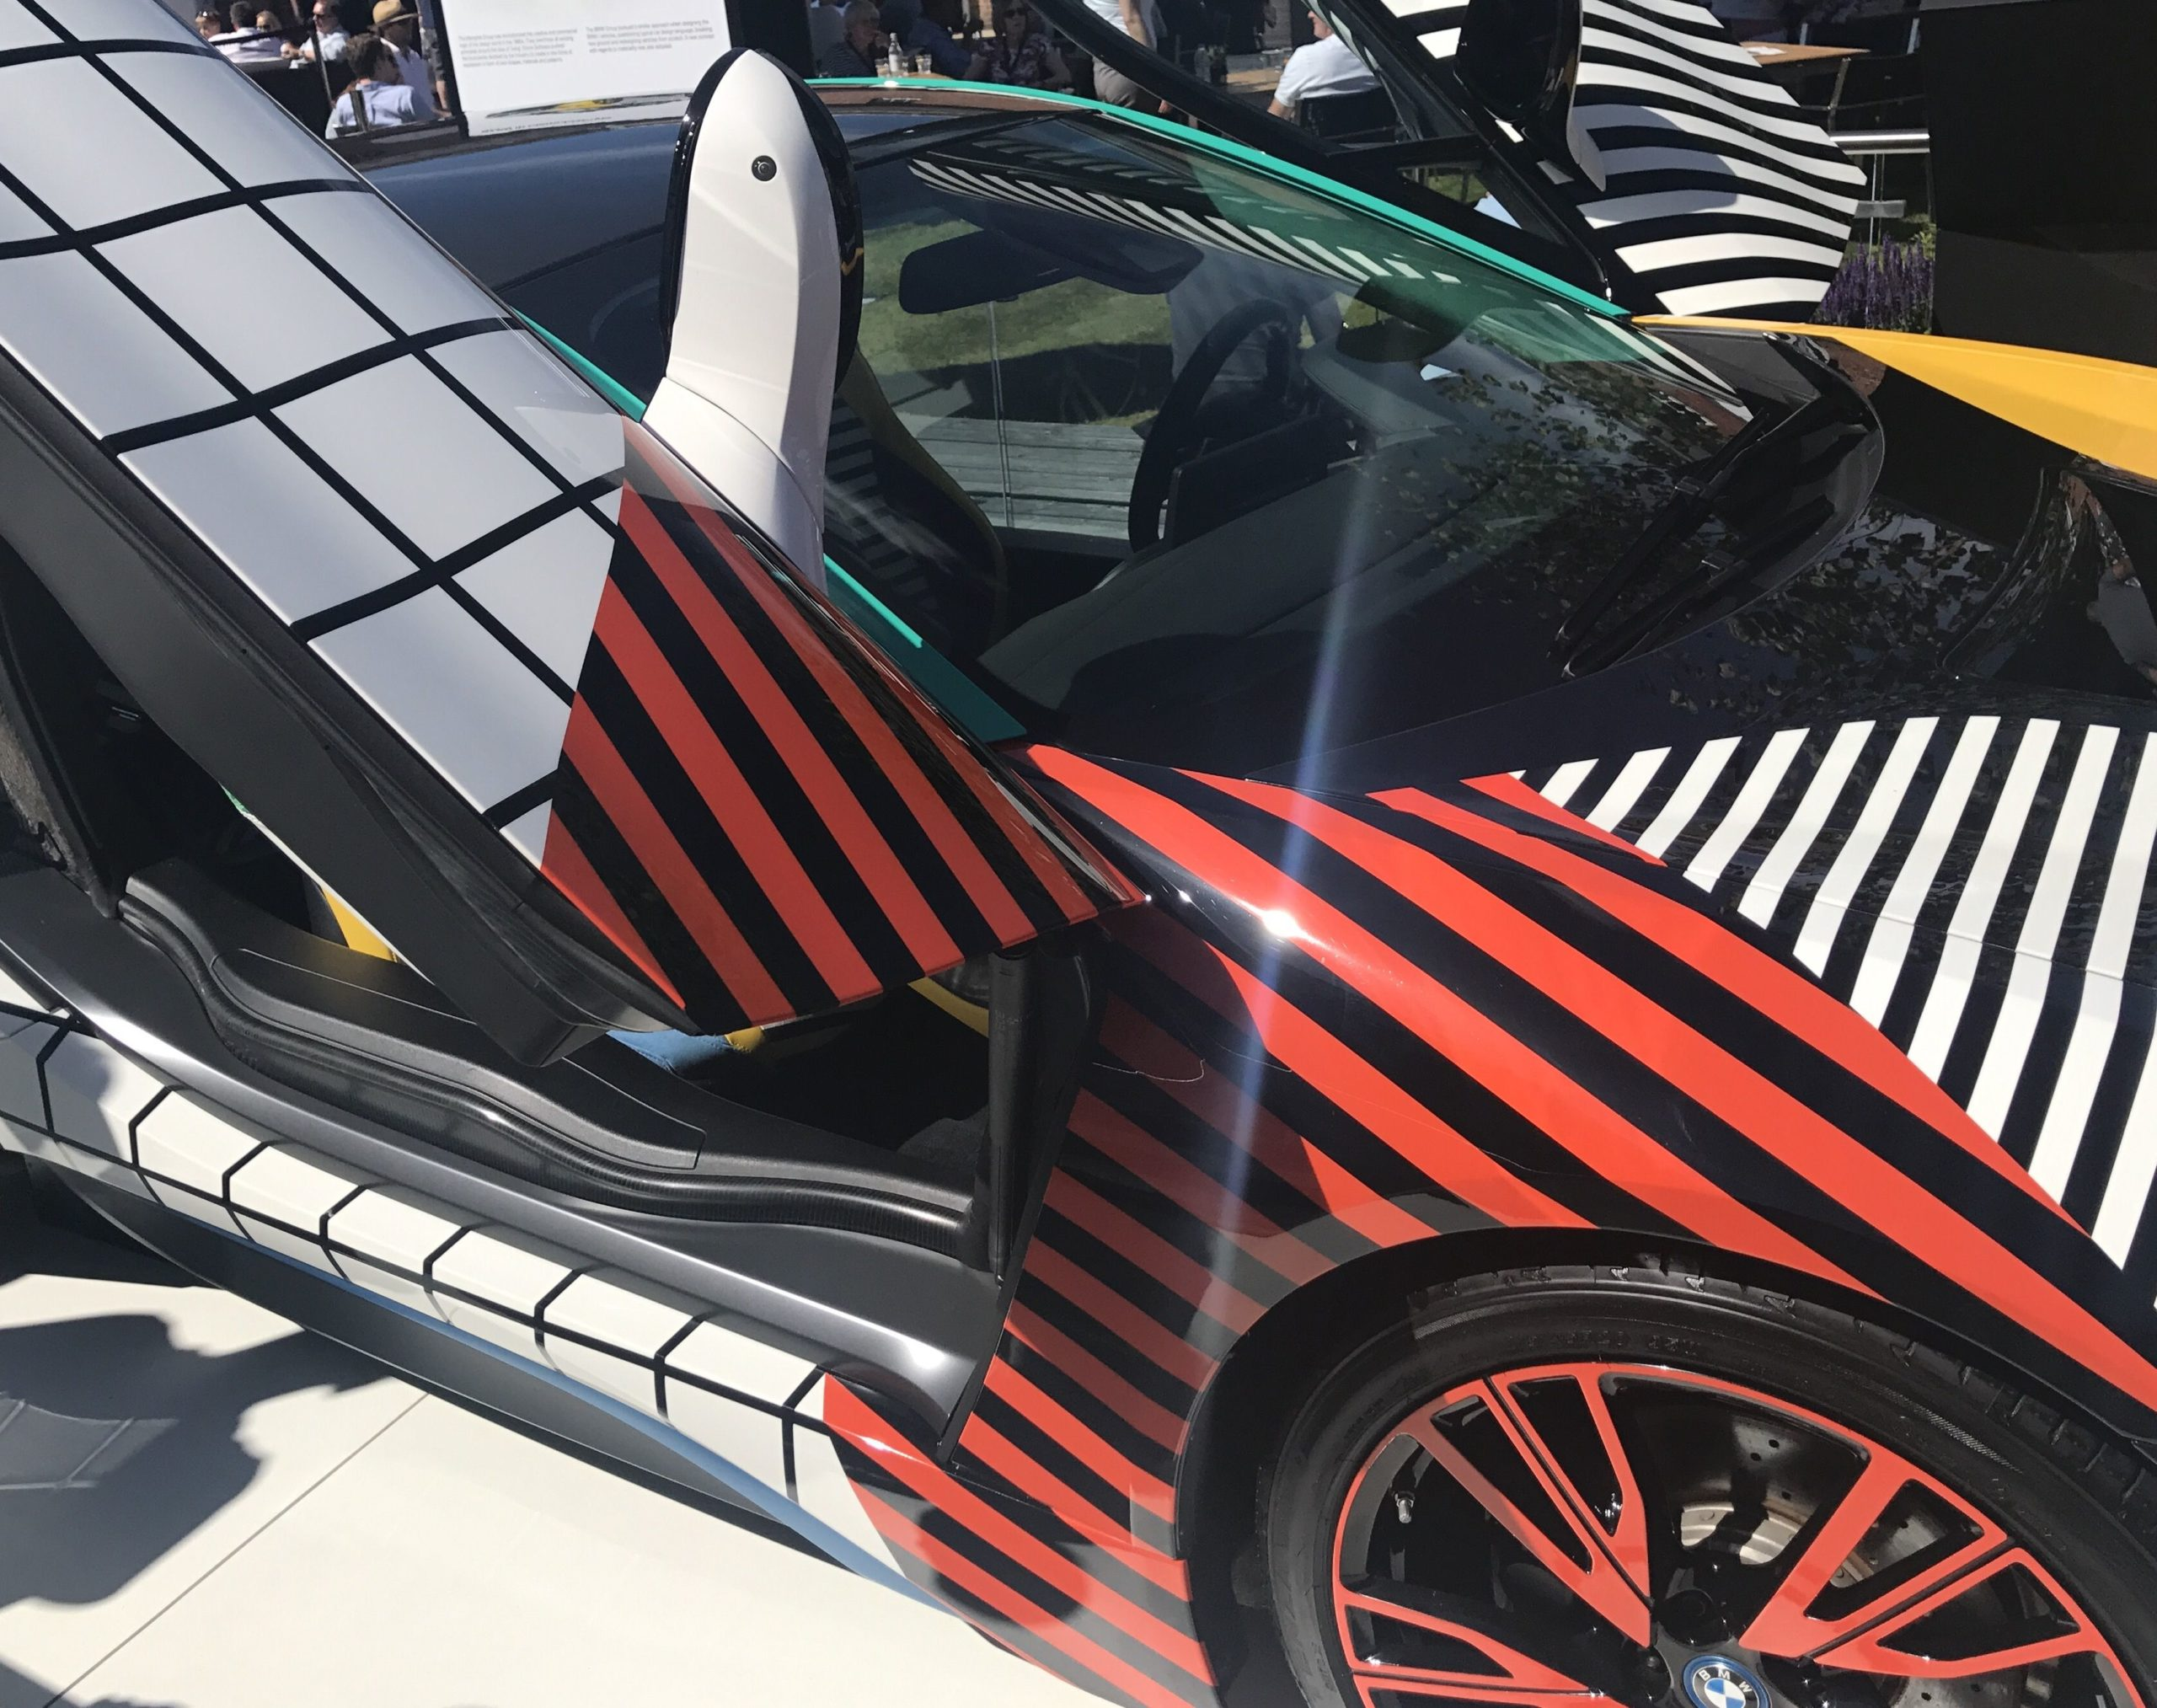 BMW i8 Memphis art car (photo – Andy Pidgeon)